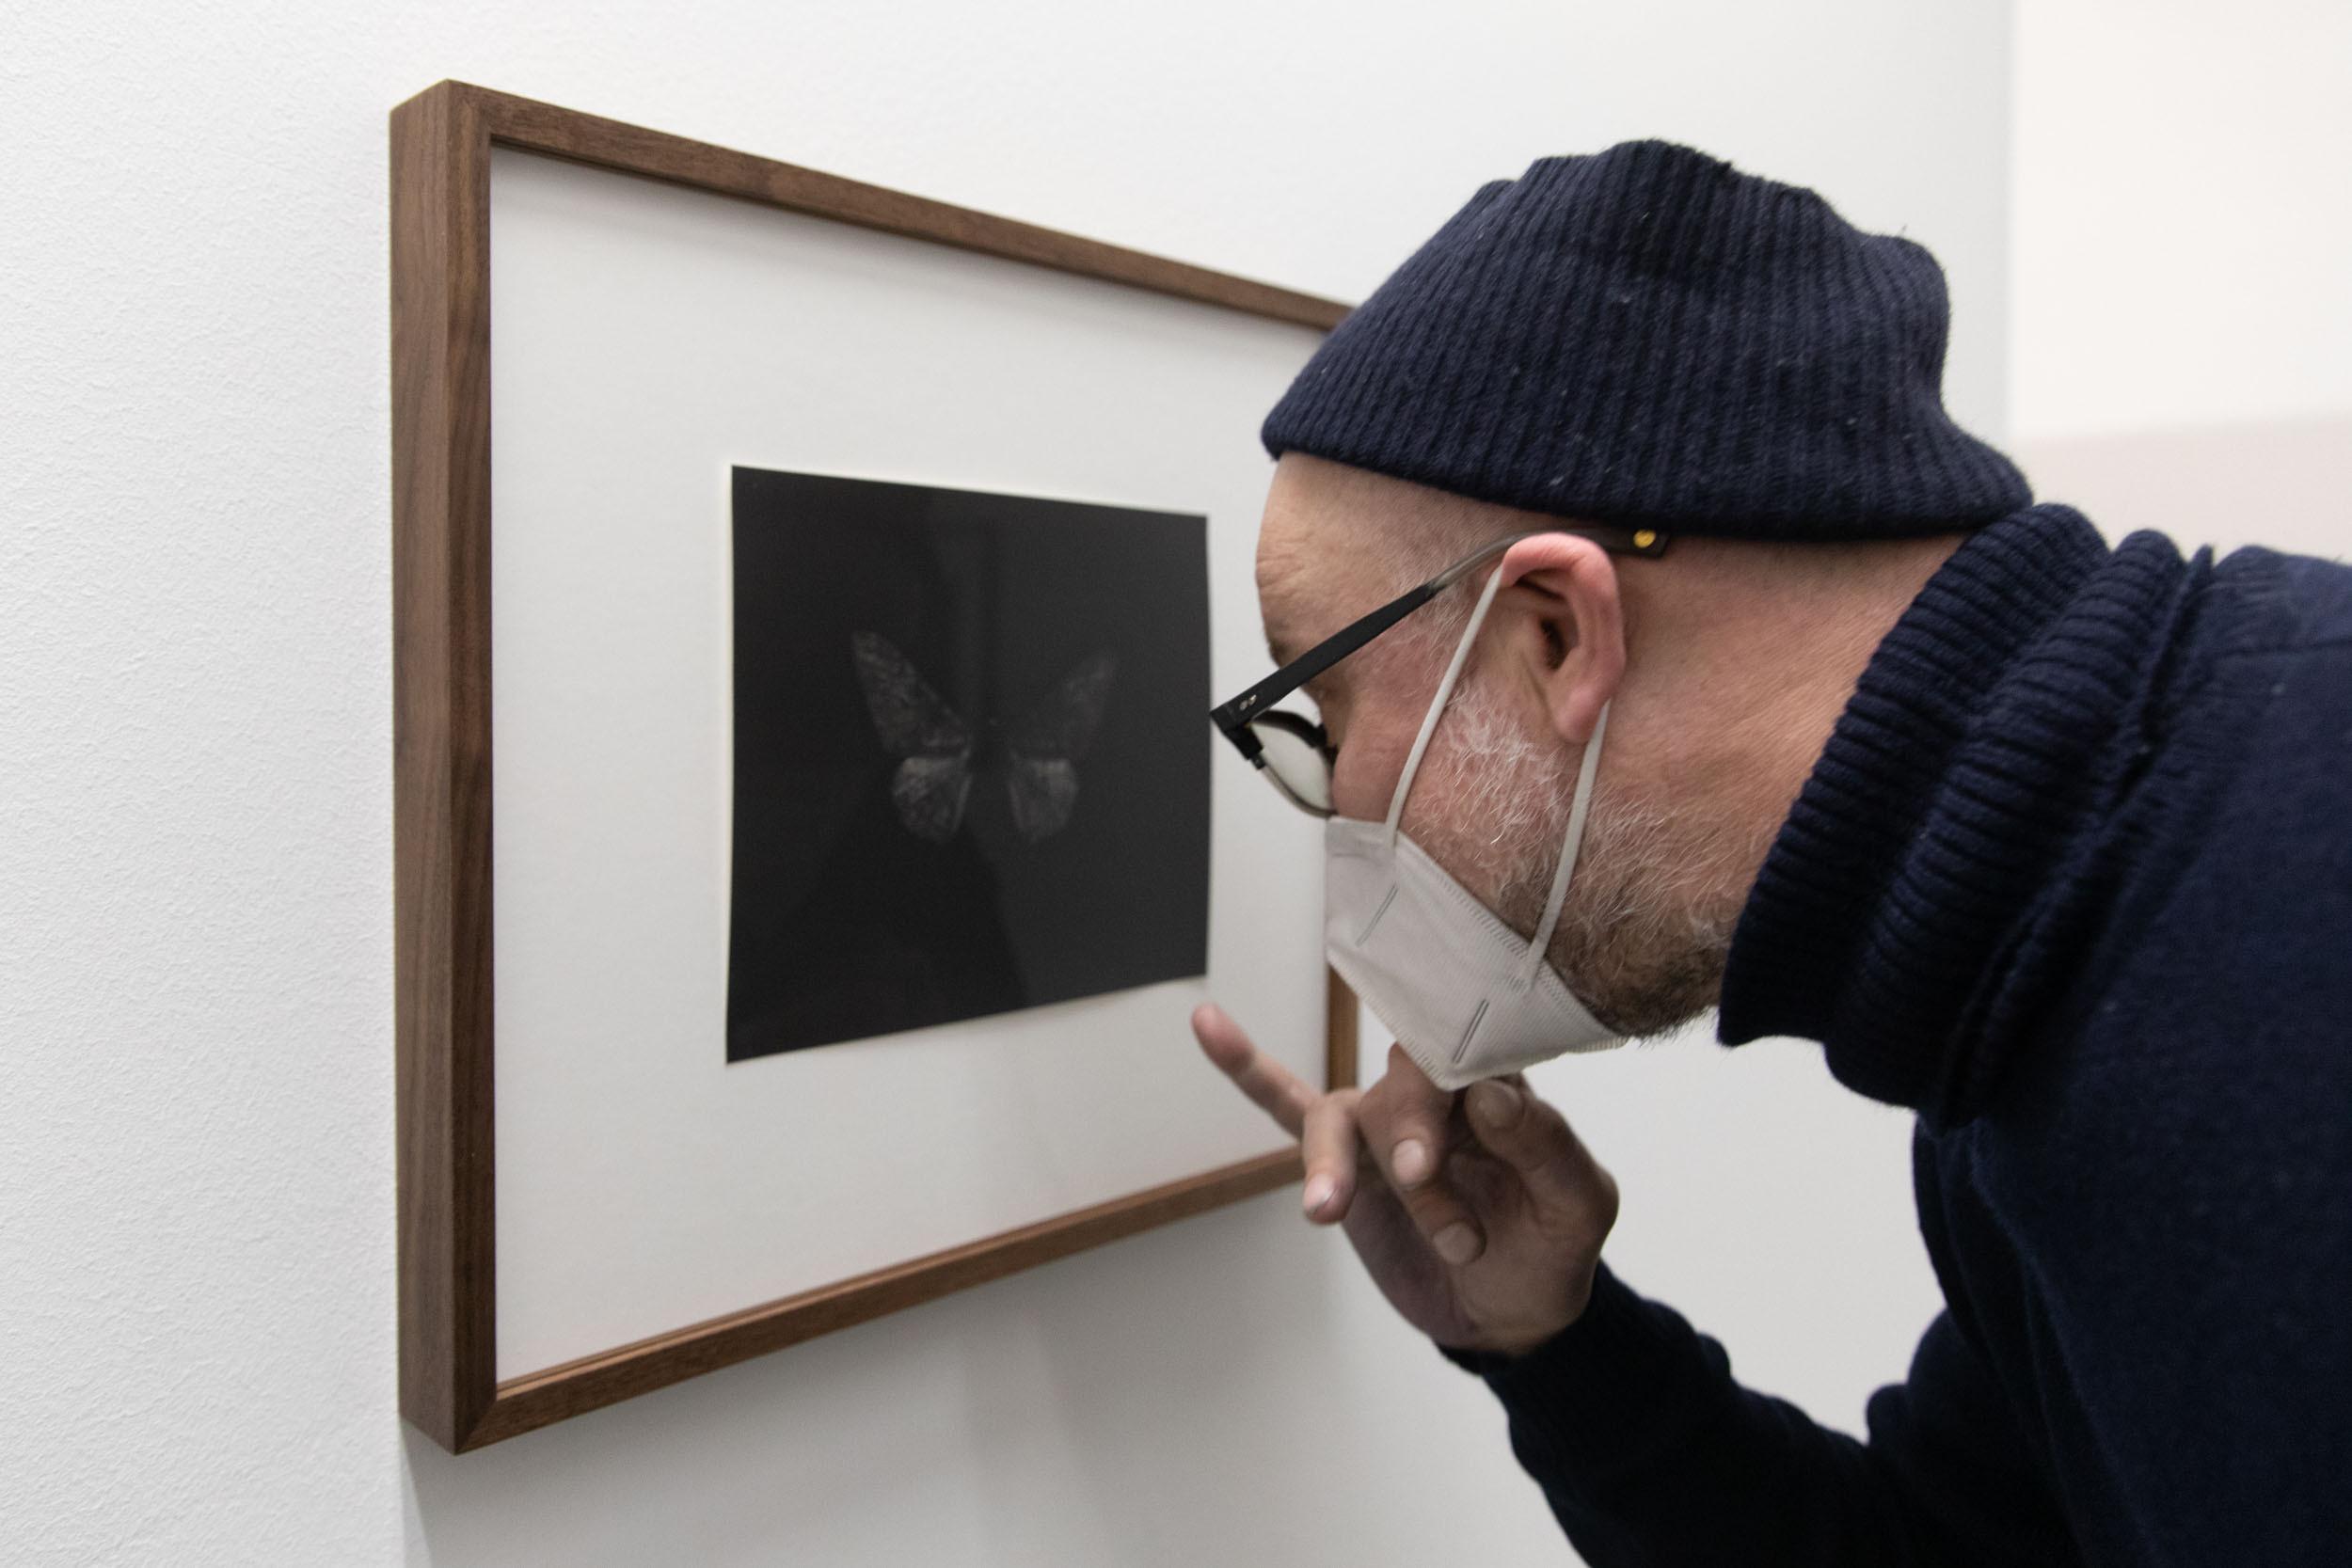 foto.esel.at: Andreas Duscha - Sky Glow (Creative Climate Care Galerie, MAK 9.2. - 28.3.2021)